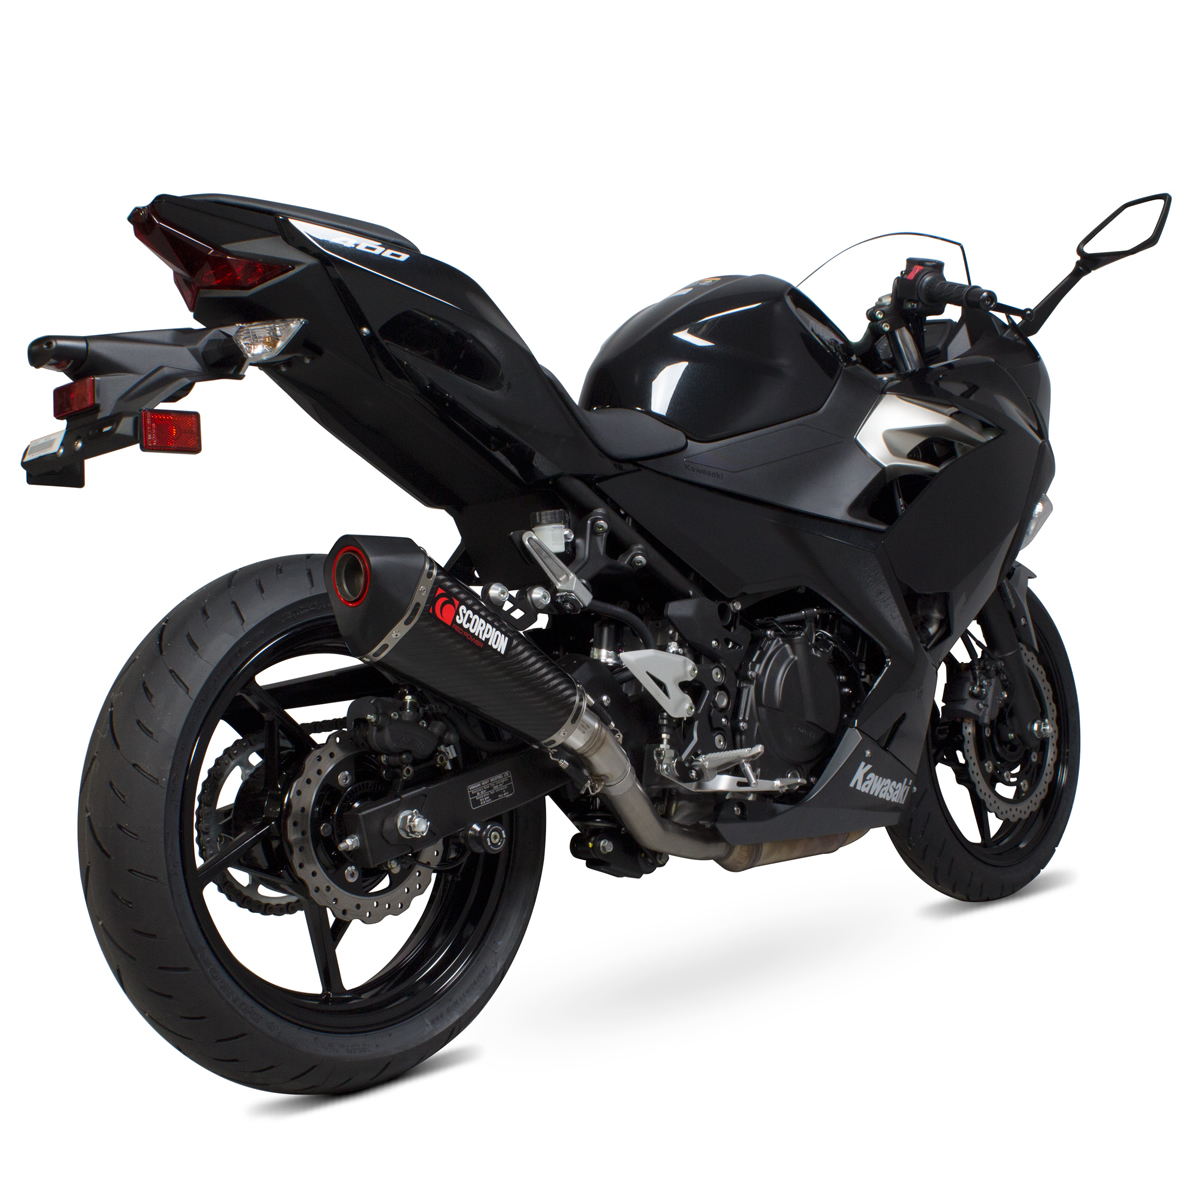 Details about Kawasaki Ninja 400 2018 - 2019 Scorpion Serket Taper Bike  Carbon Slip On Exhaust